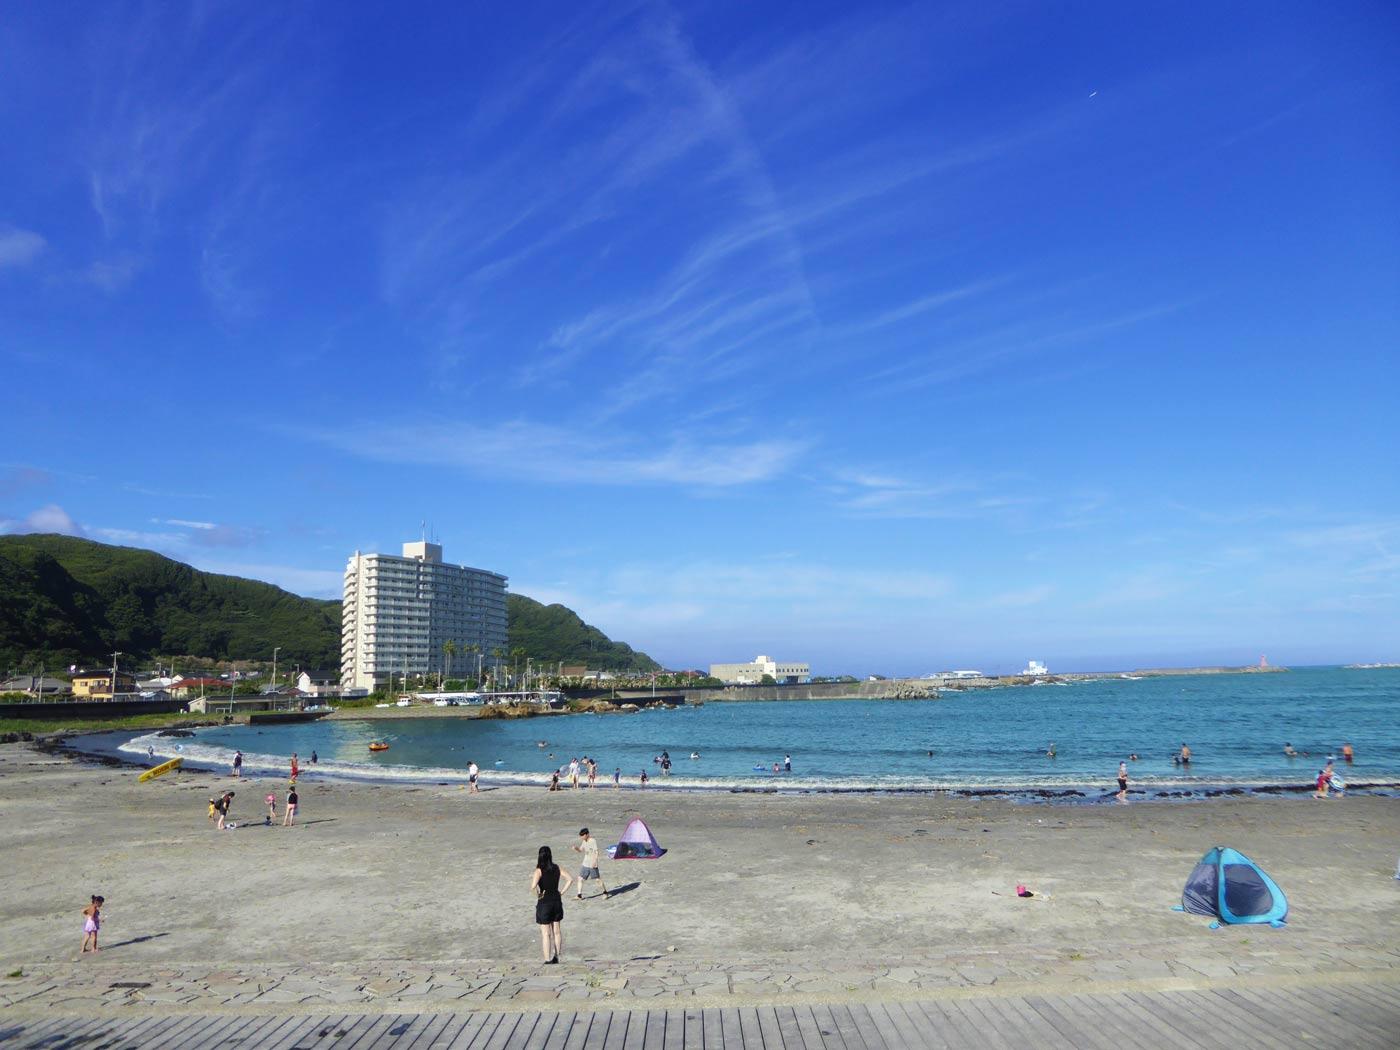 塩浦海水浴場の砂浜